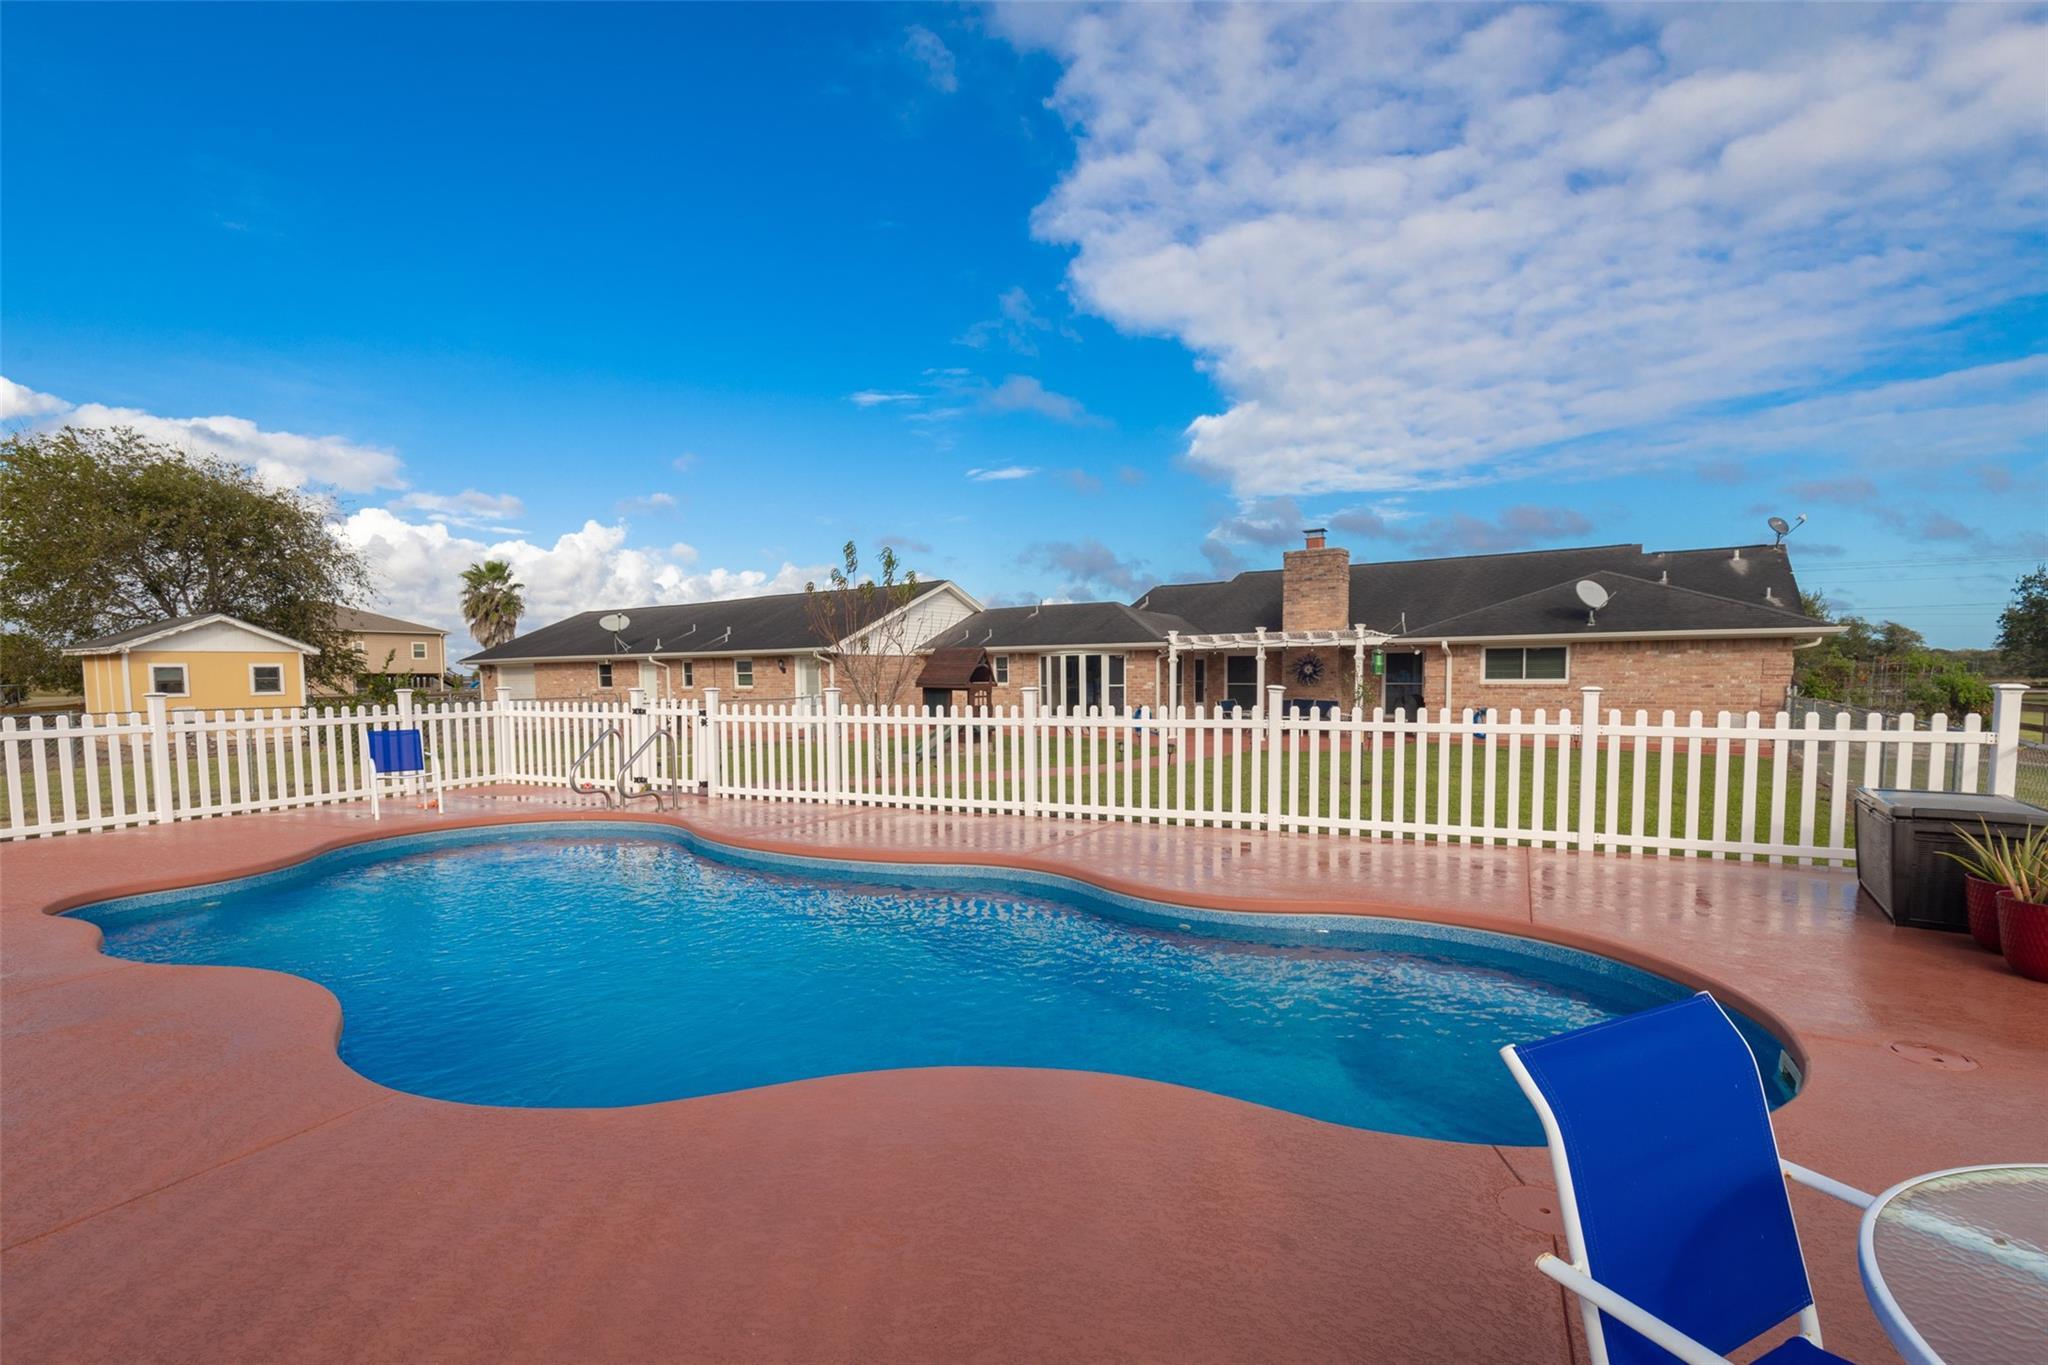 20588 Fm 457 Property Photo - Sargent, TX real estate listing